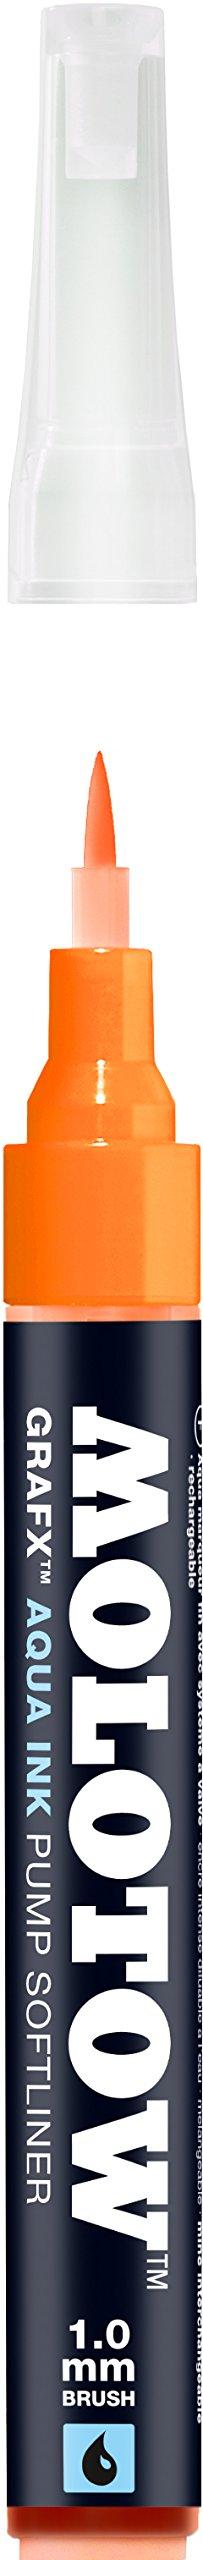 Molotow Grafx Aqua Ink Soft Liner Brush Pump Marker, Orange